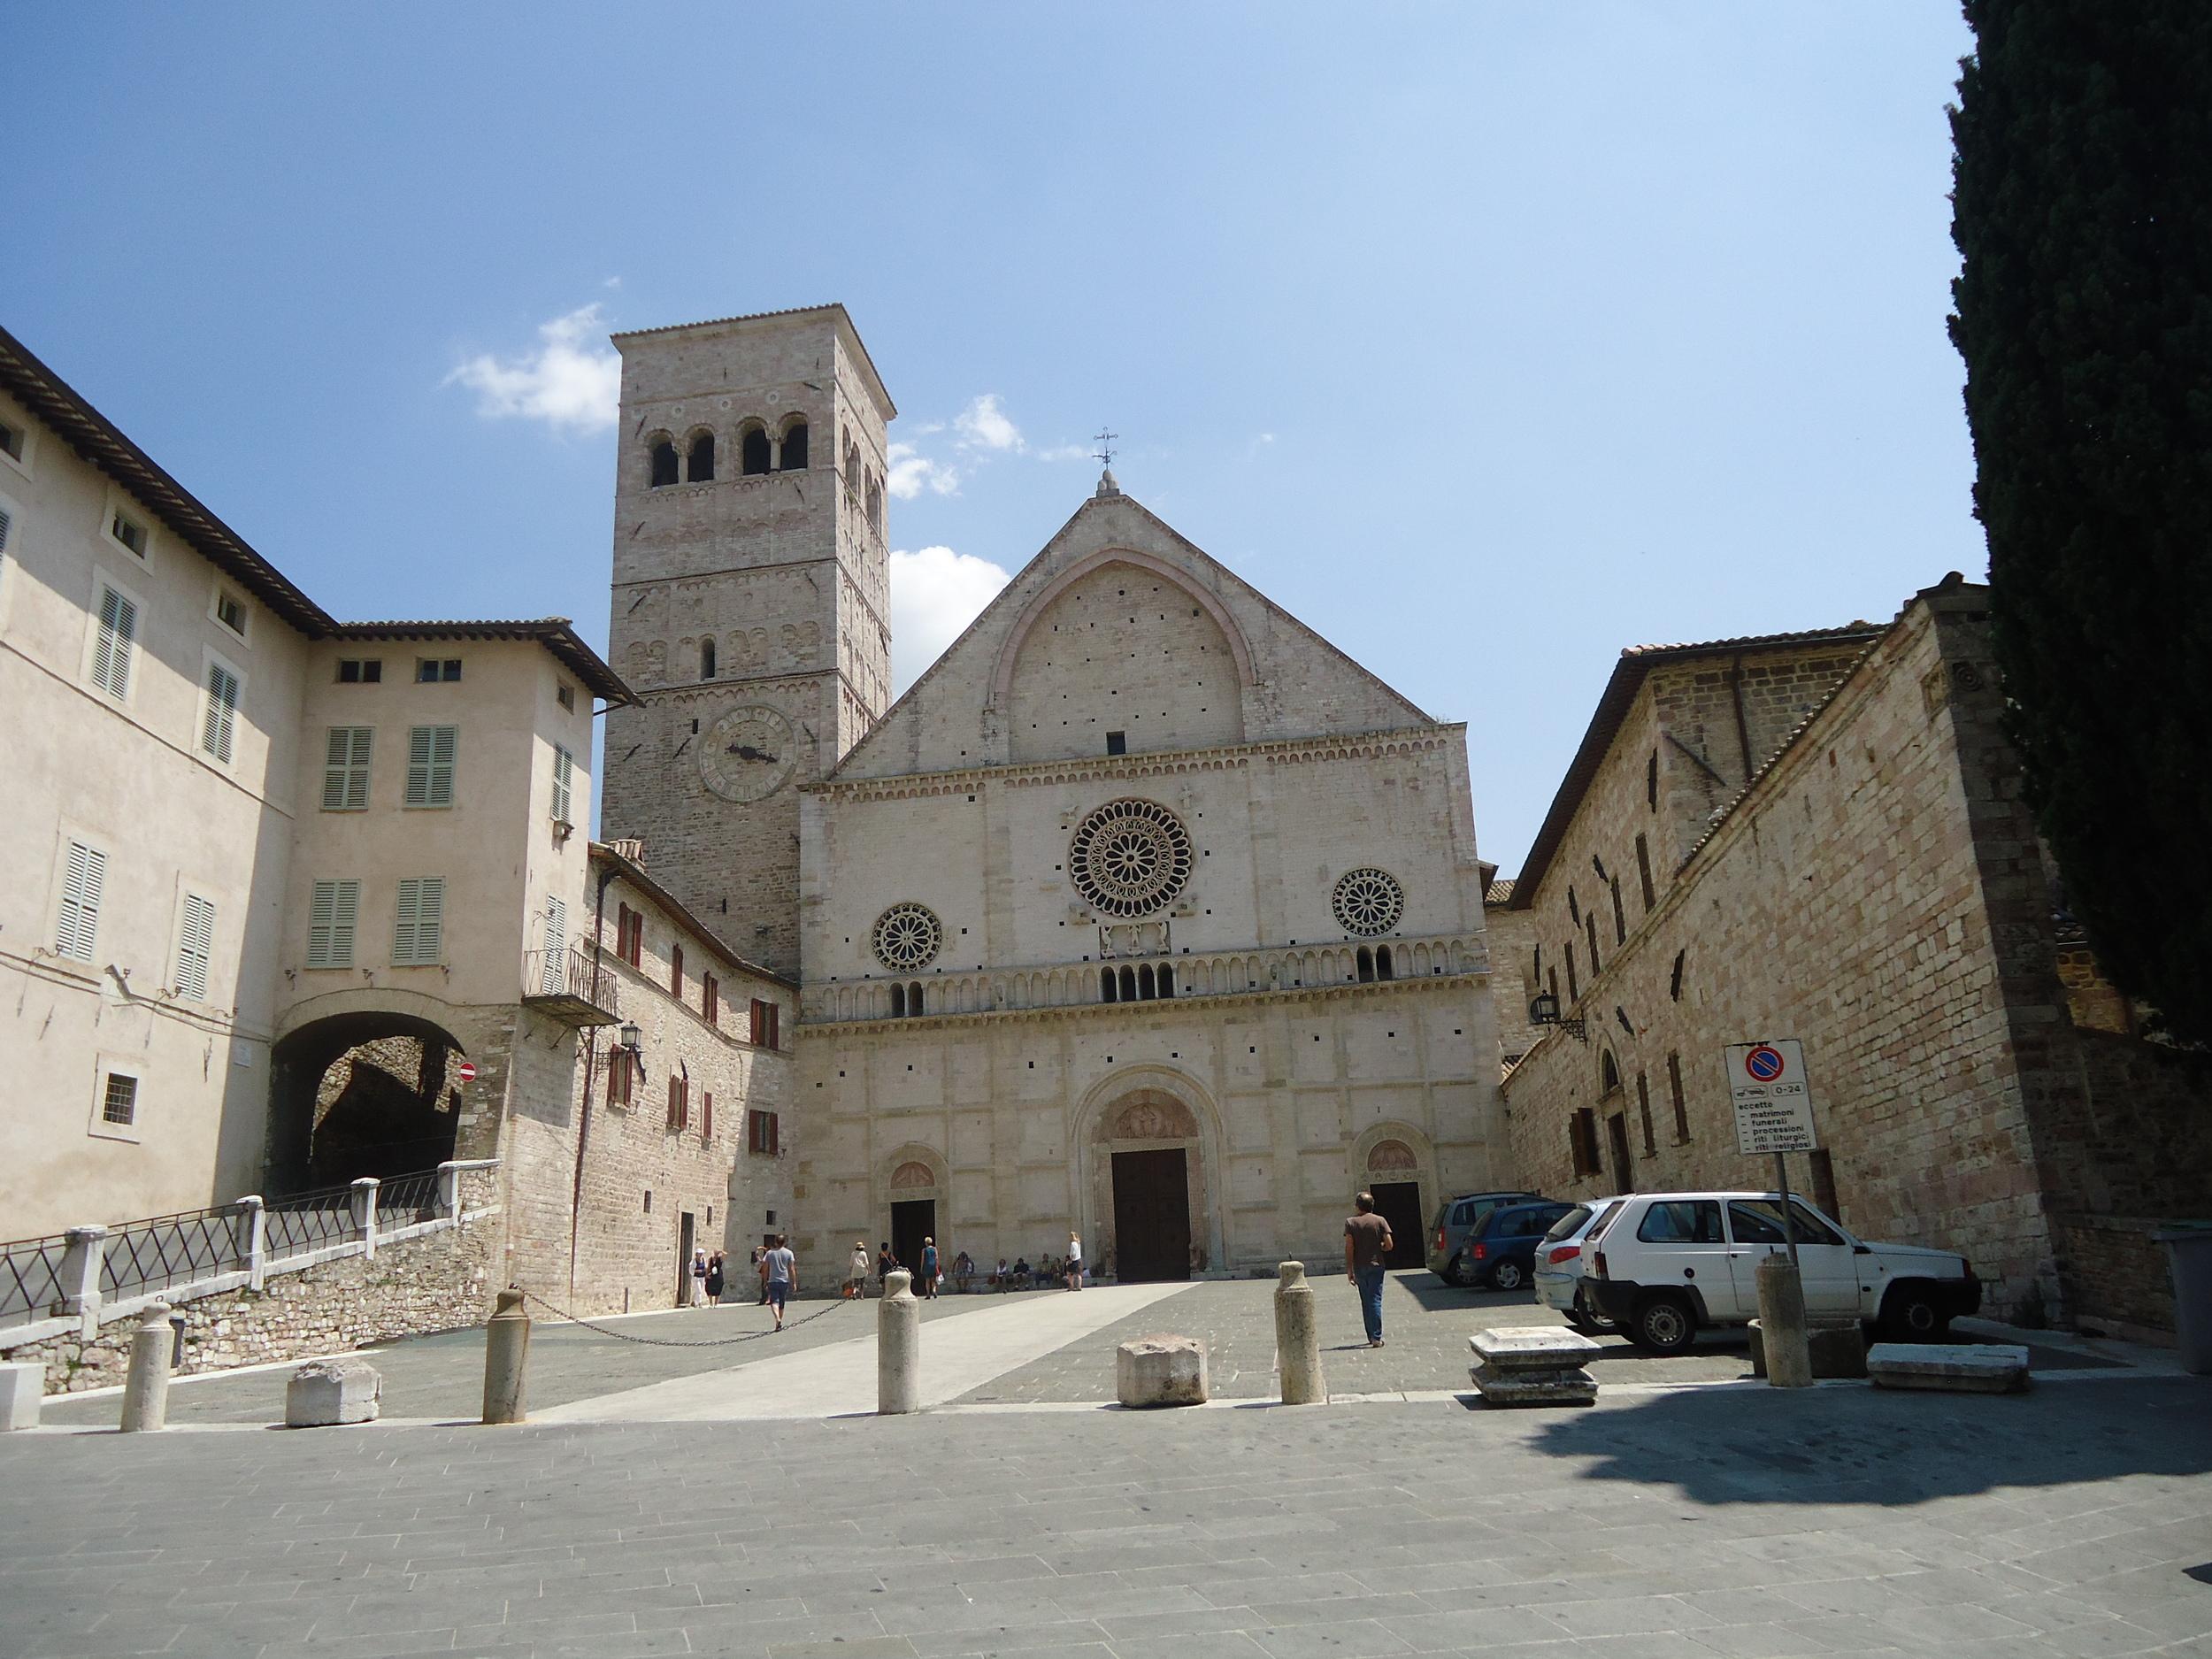 CRO Italy web 2013 - 017.JPG